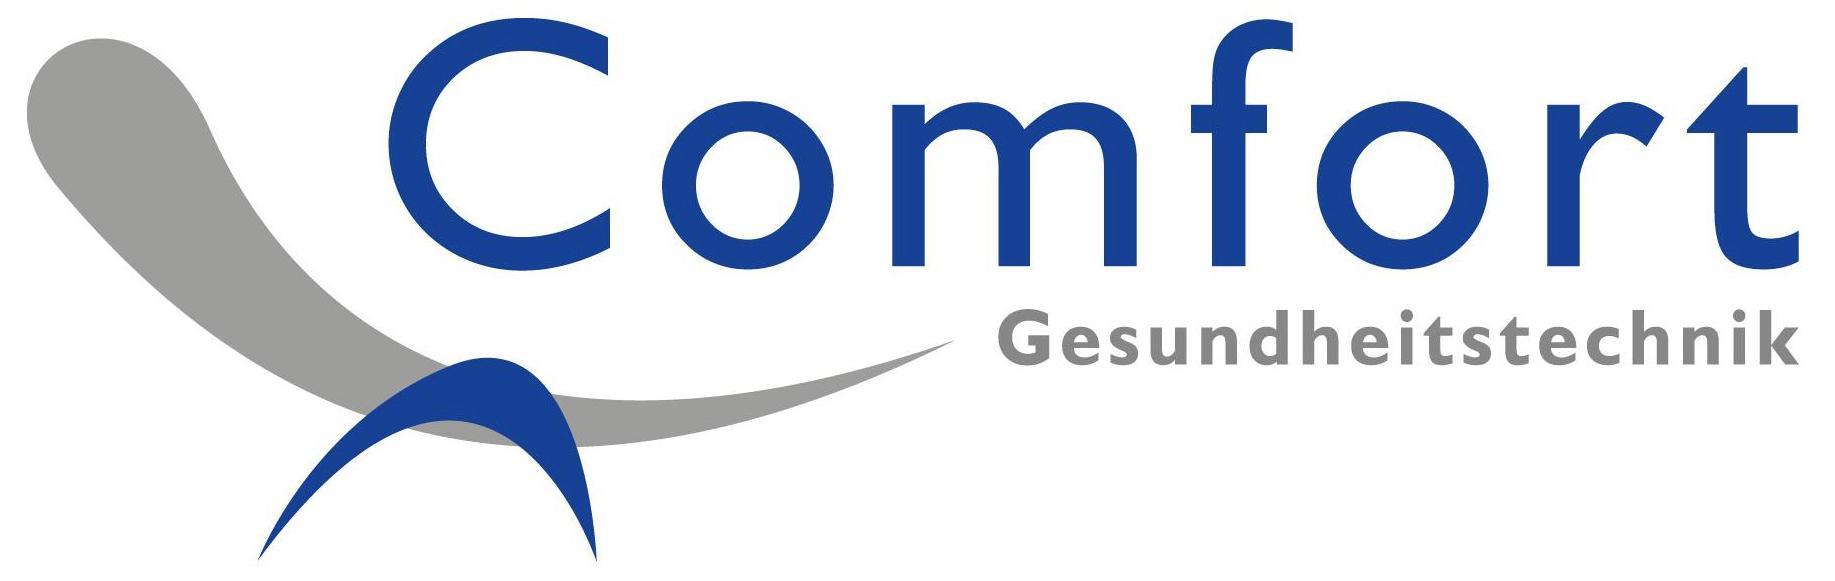 Comfort Gesundheitstechnik GmbH & Co. KG